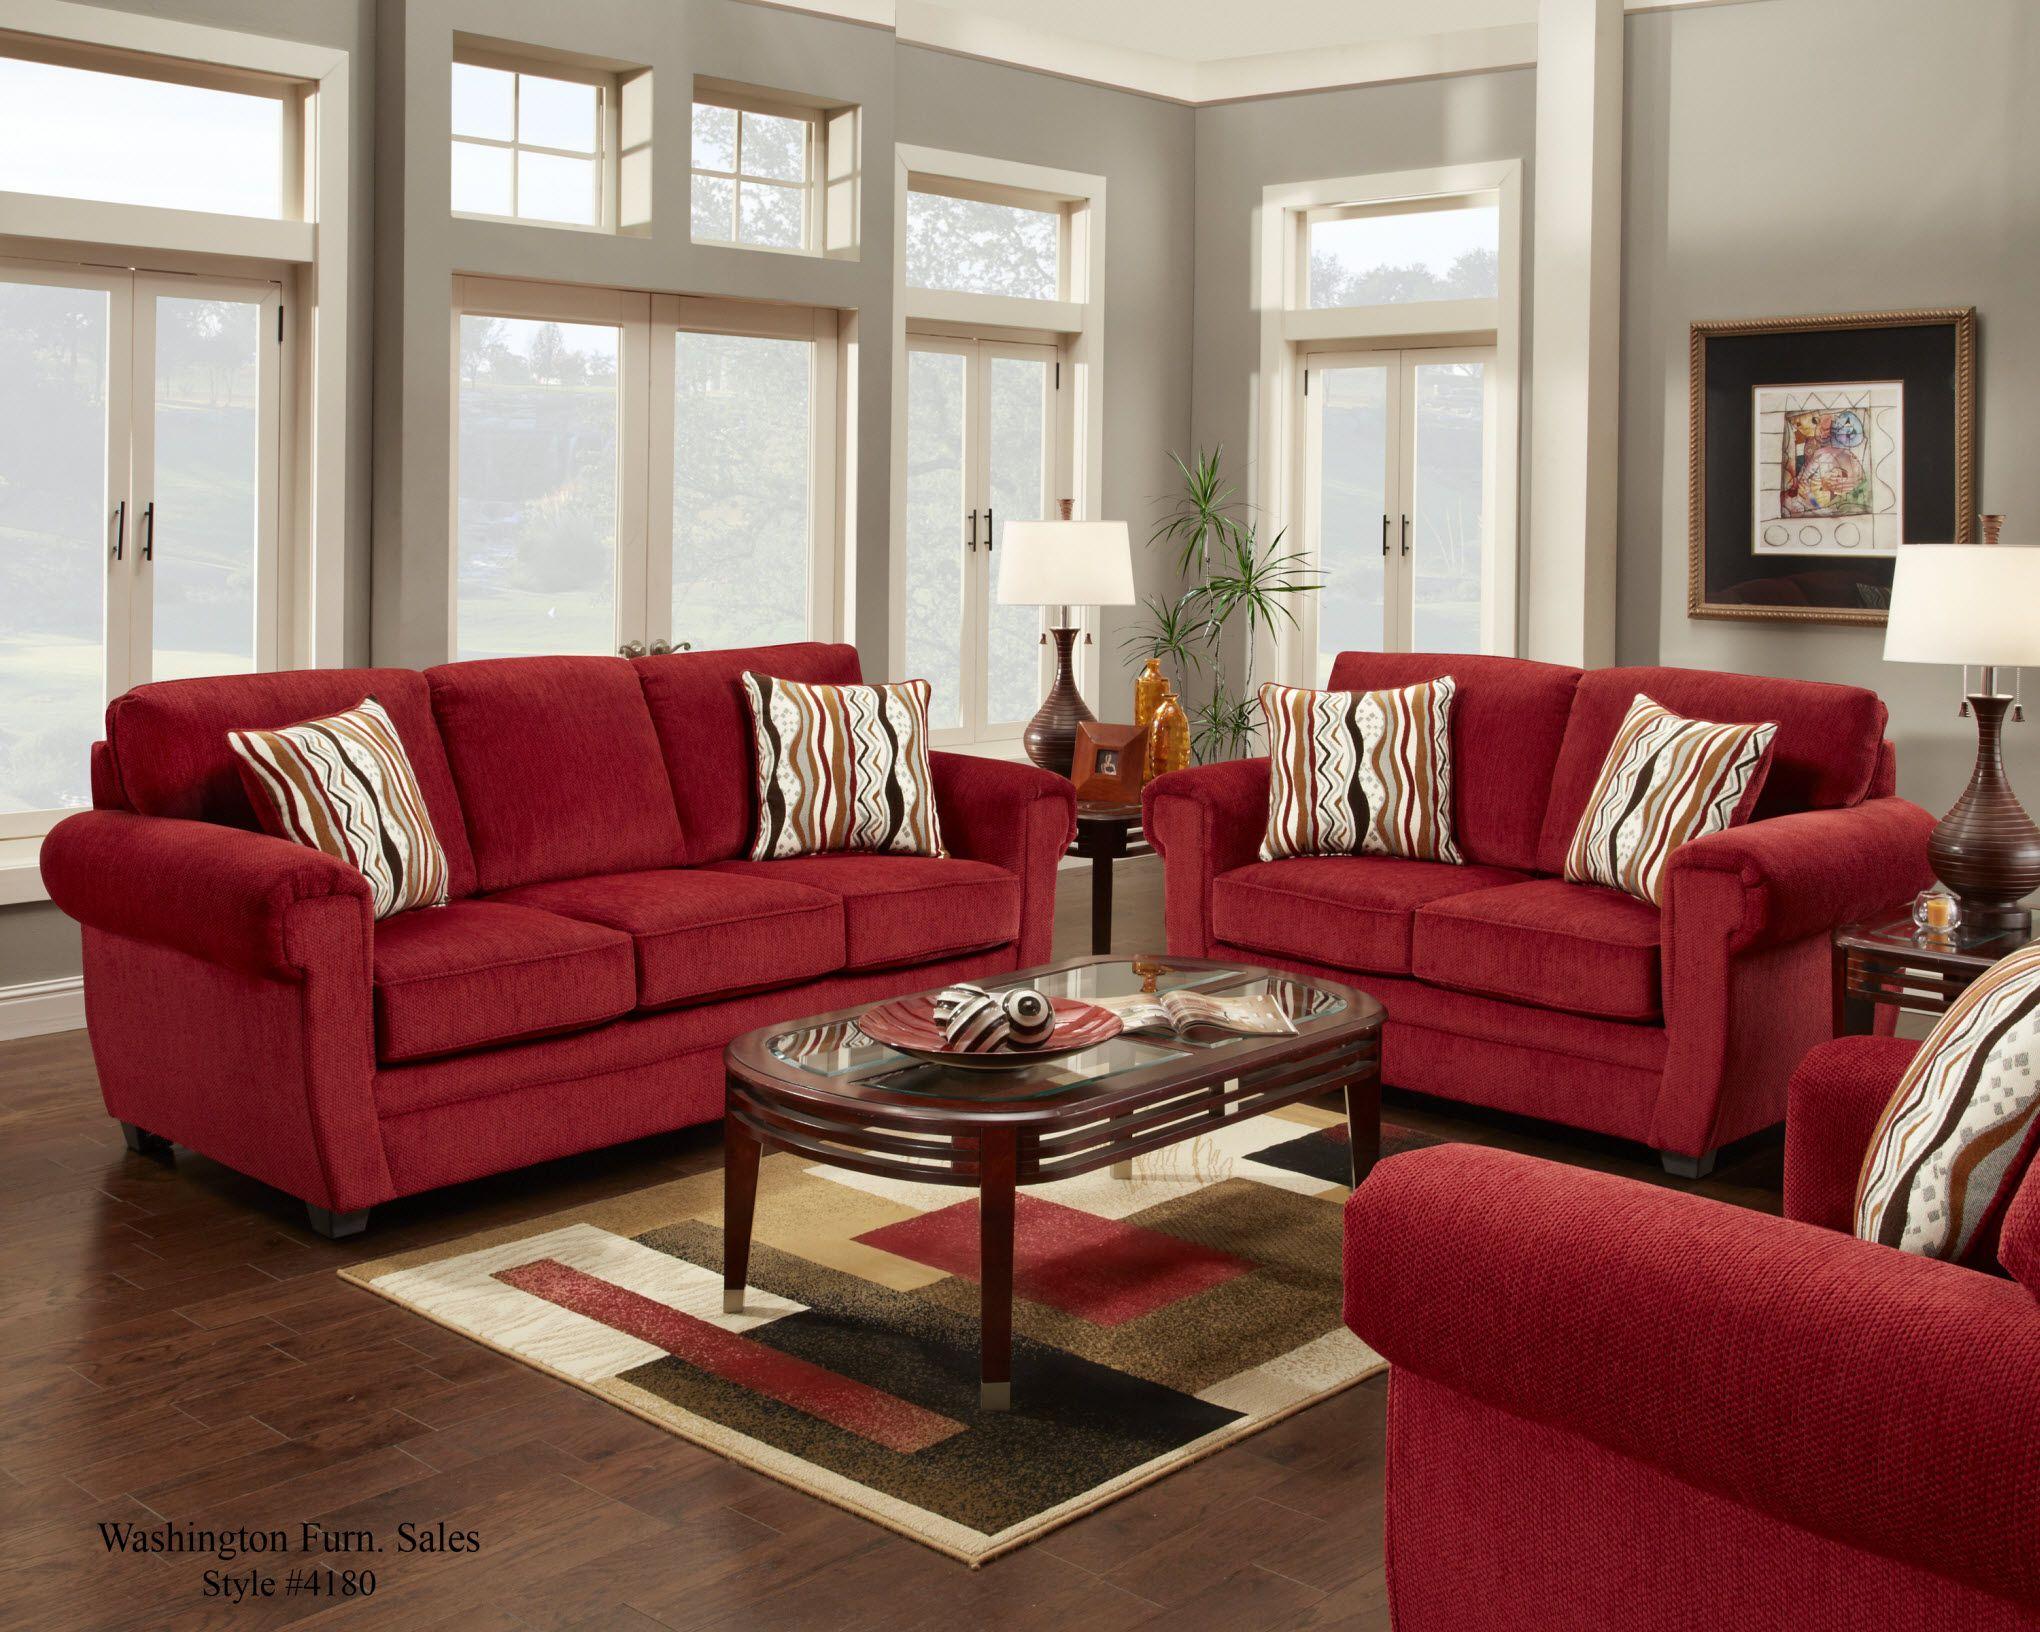 4180 Washington Samson Red Sofa and Loveseat @ www